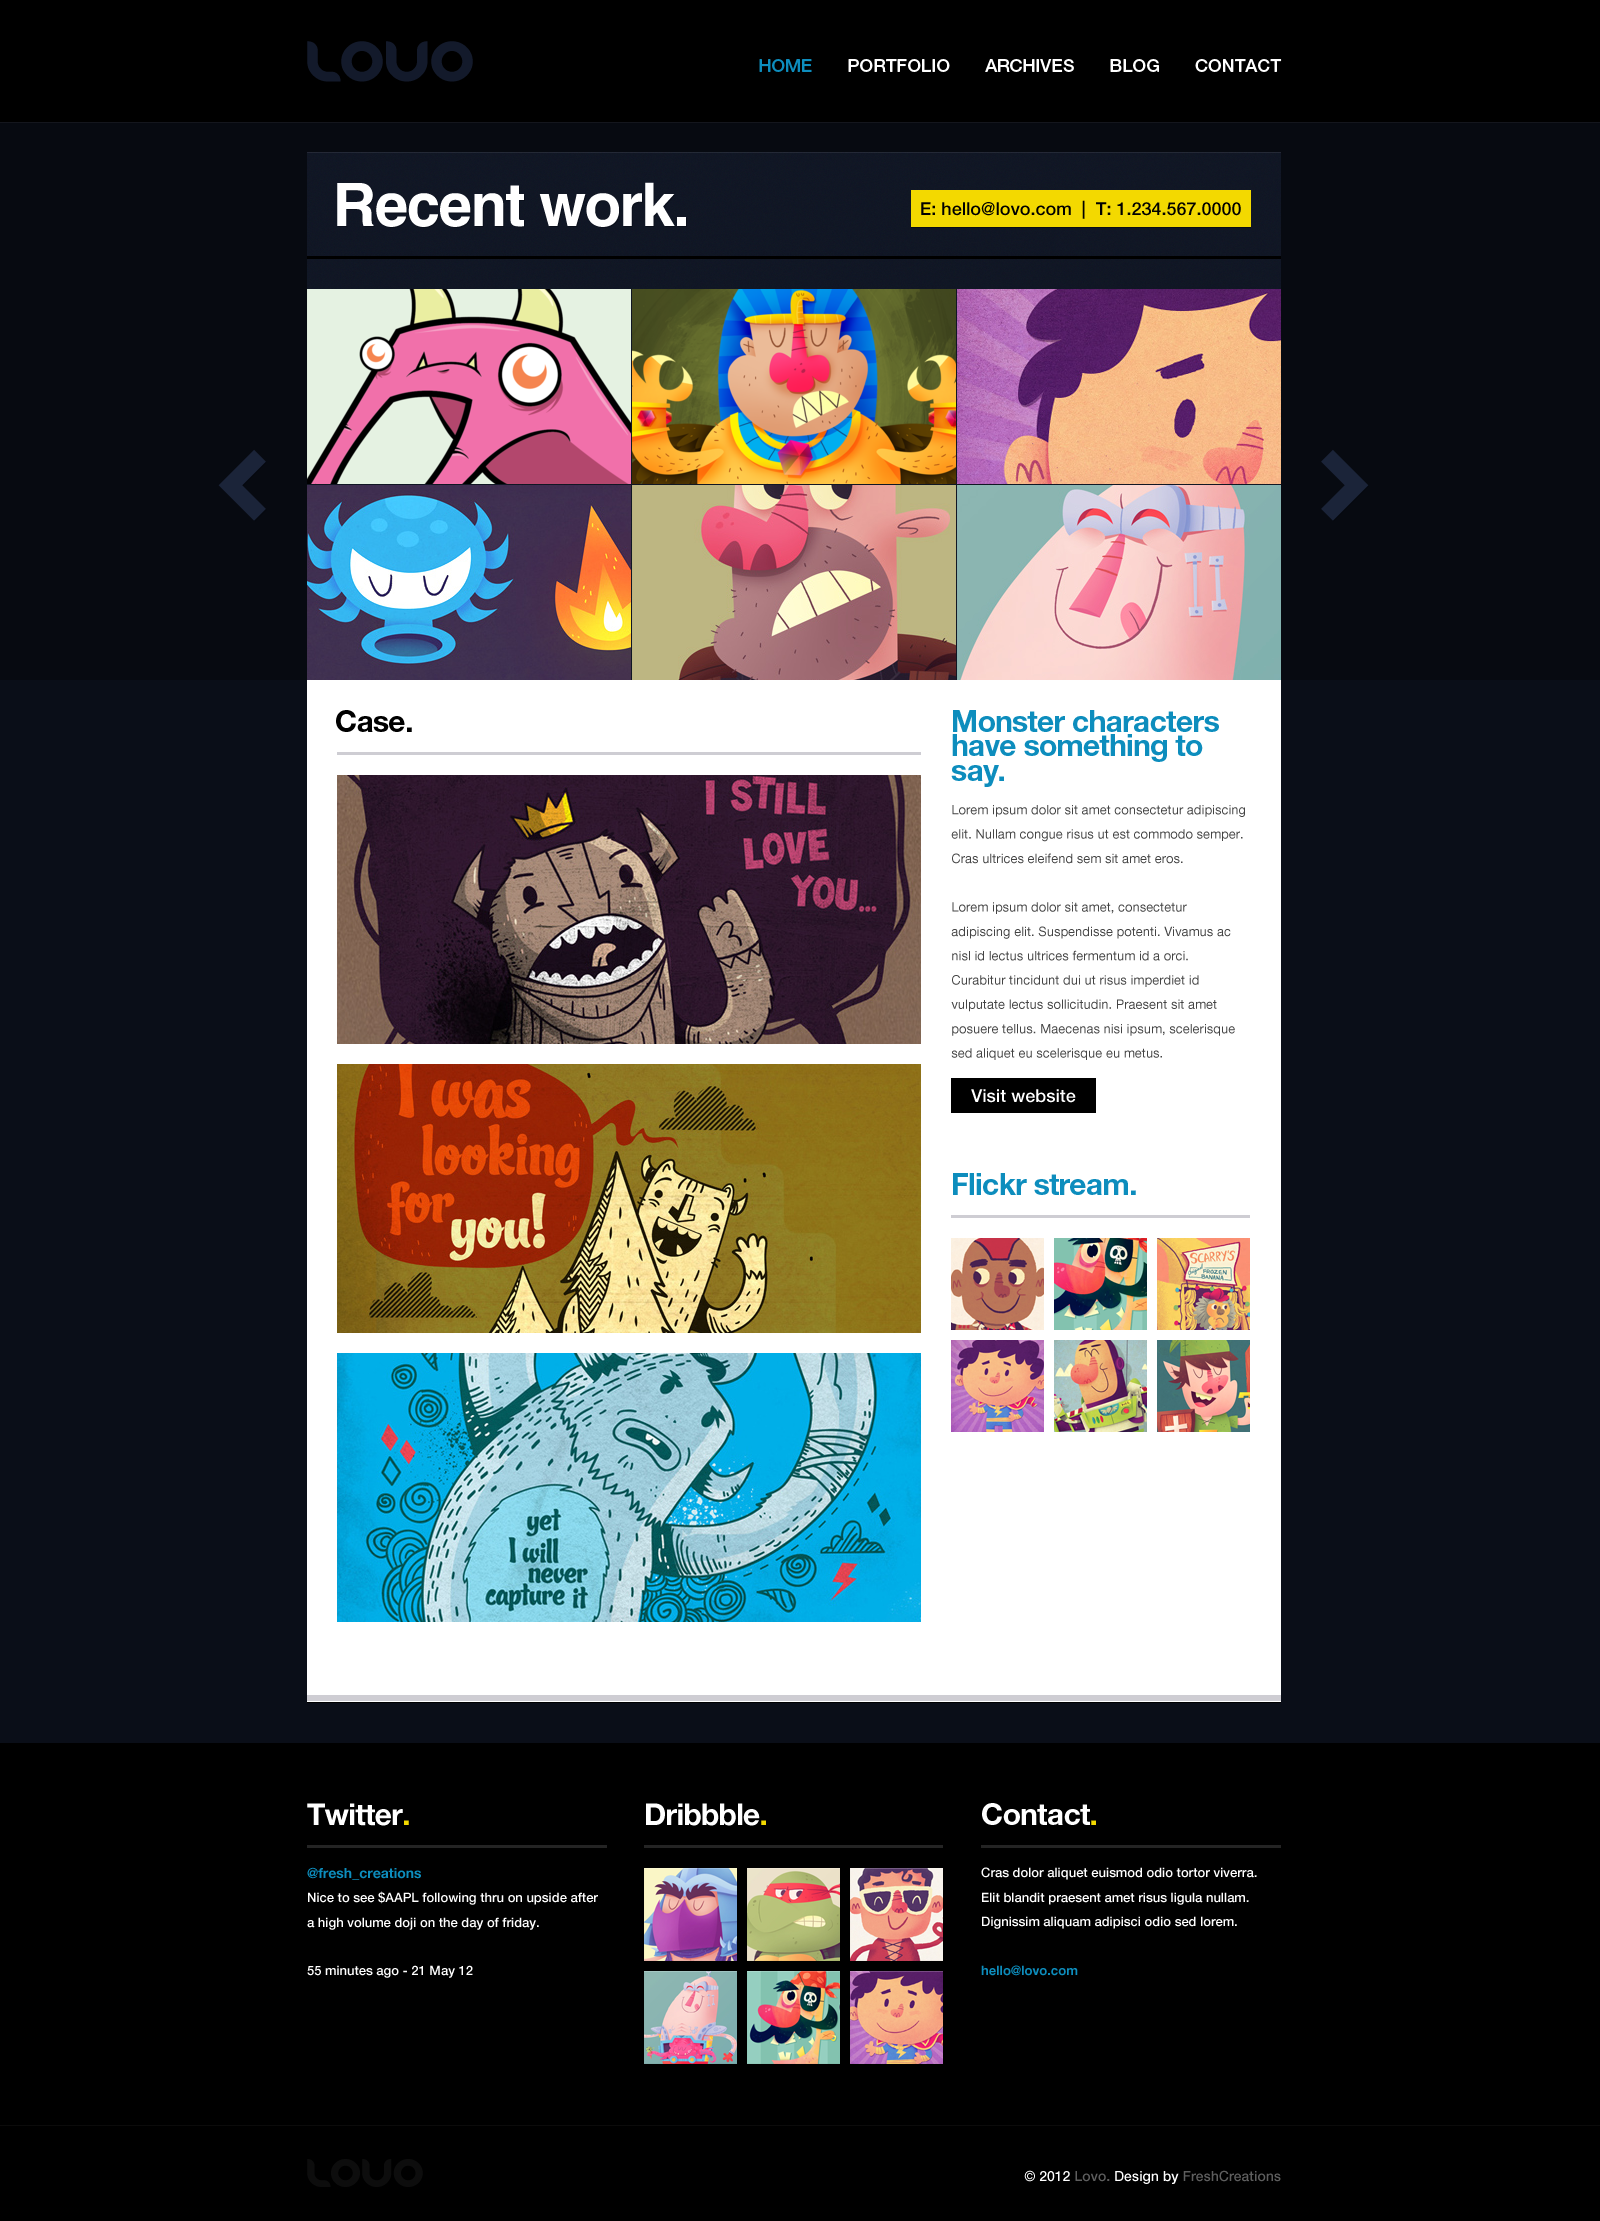 Lovo Portfolio and Blog Theme